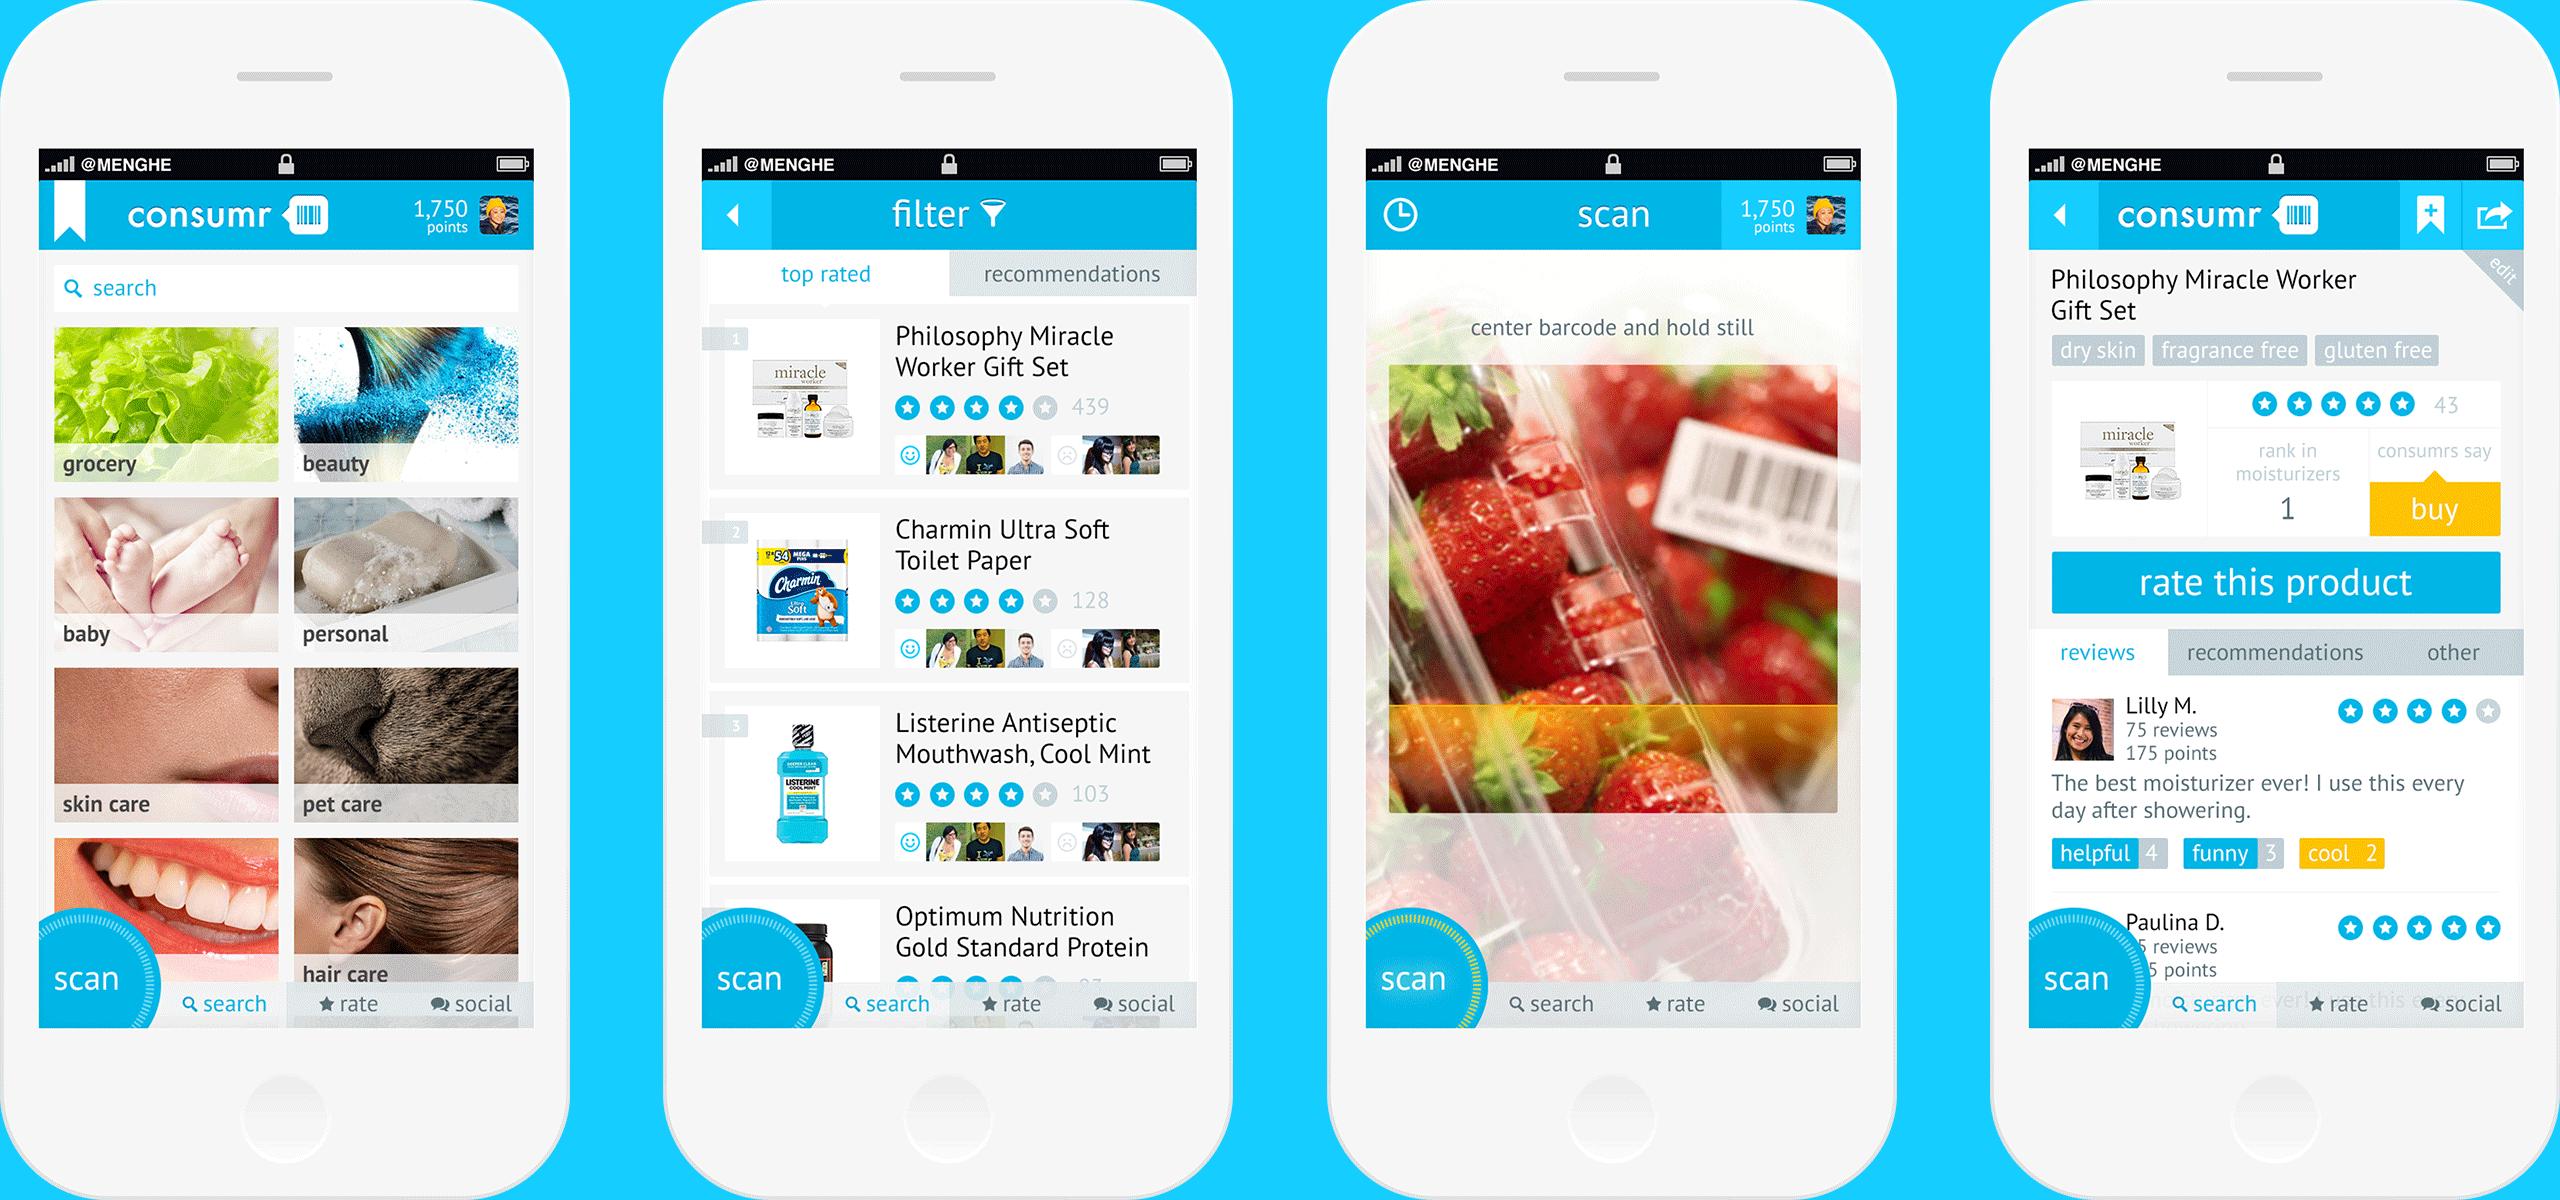 meng-he-consumr-final-app-design-browse-lb